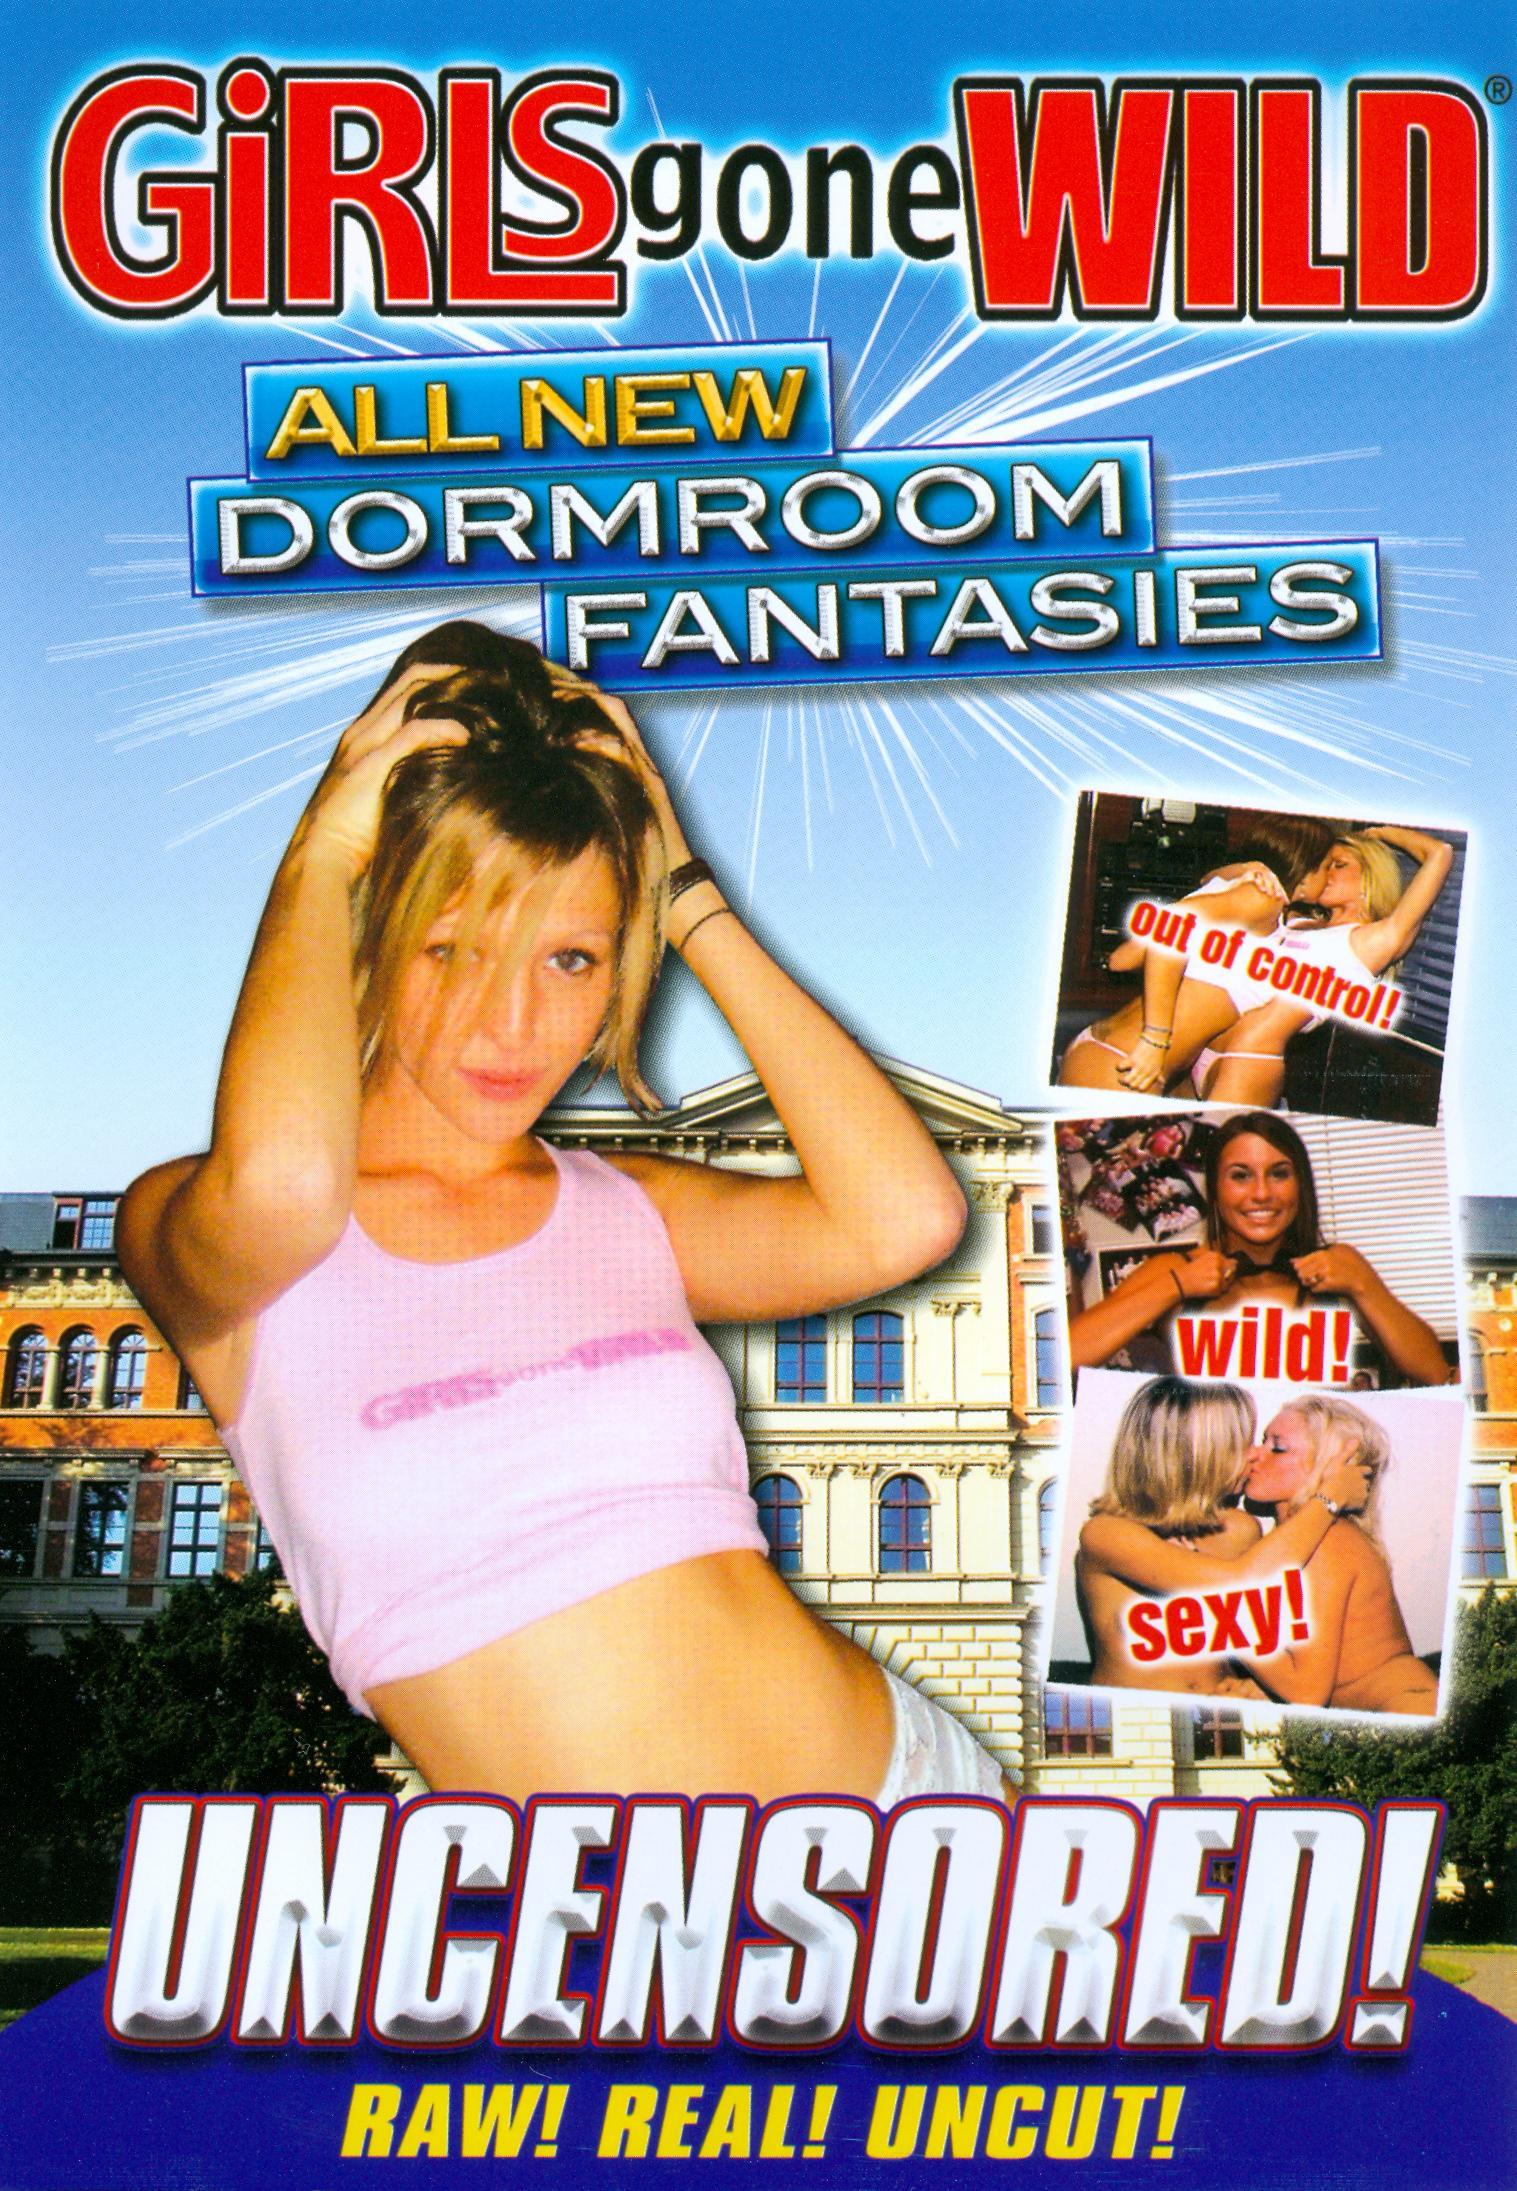 Girls Gone Wild: Dormroom Fantasies